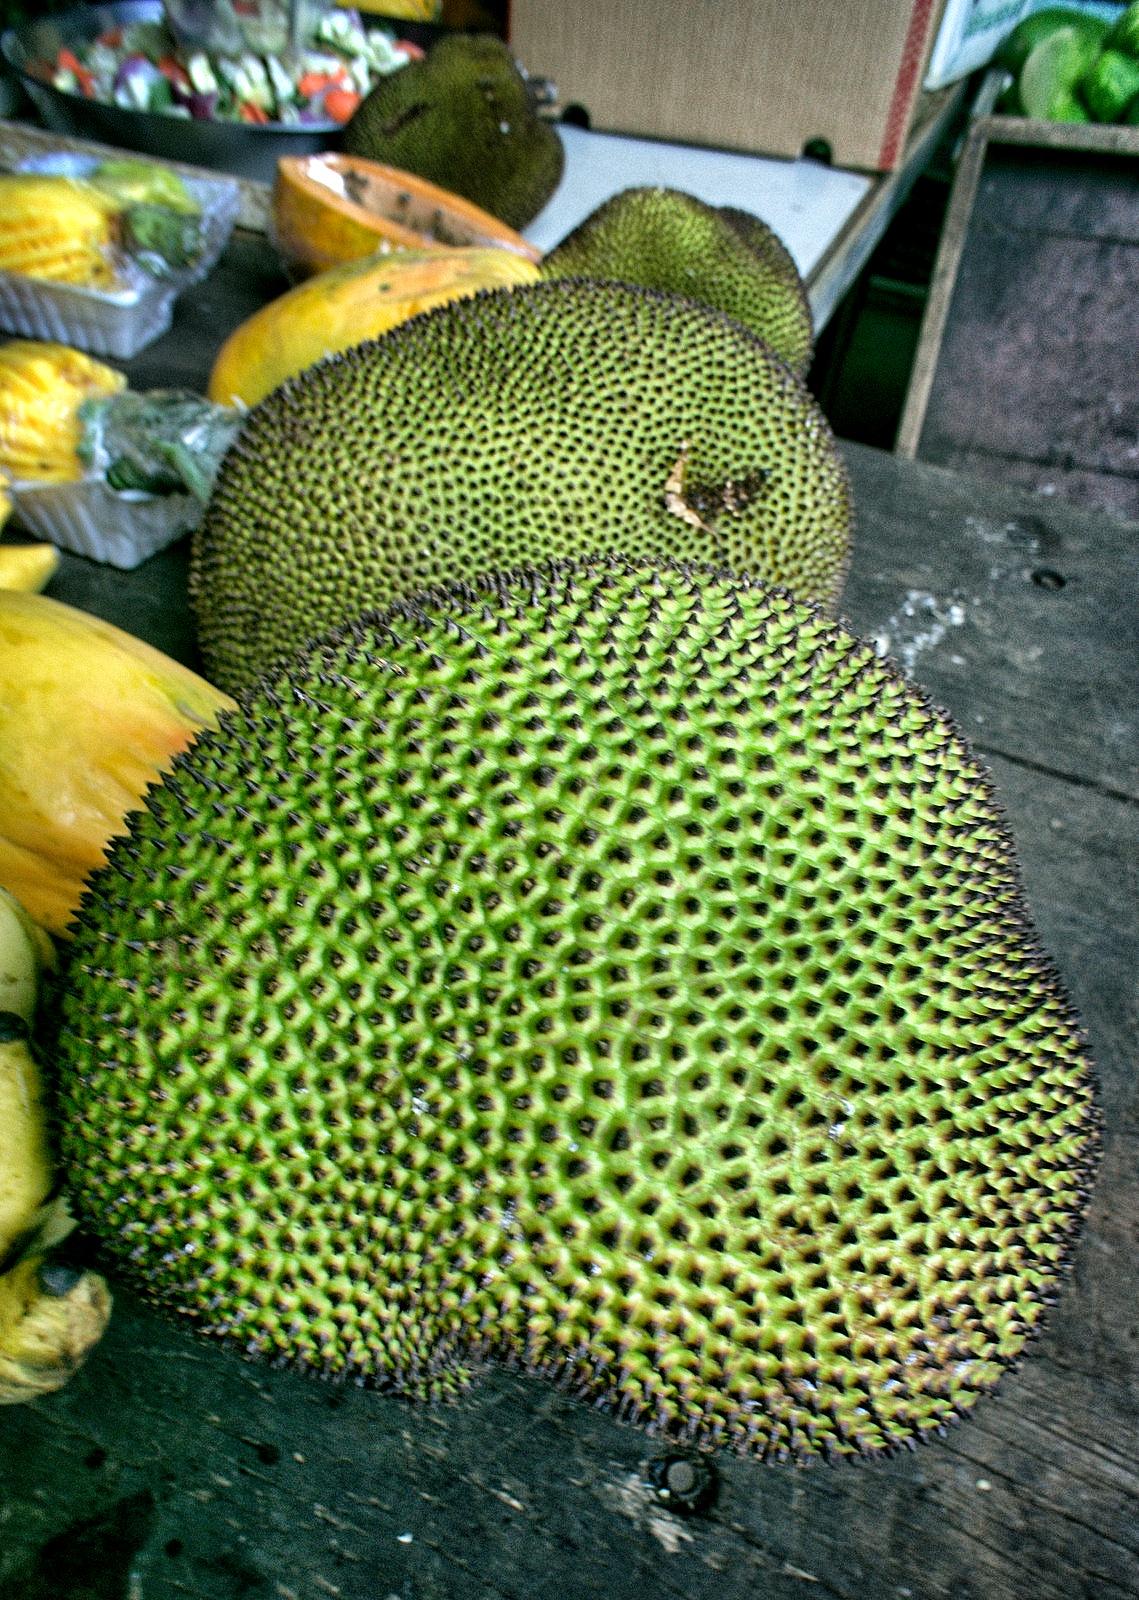 Haitian Jackfruit